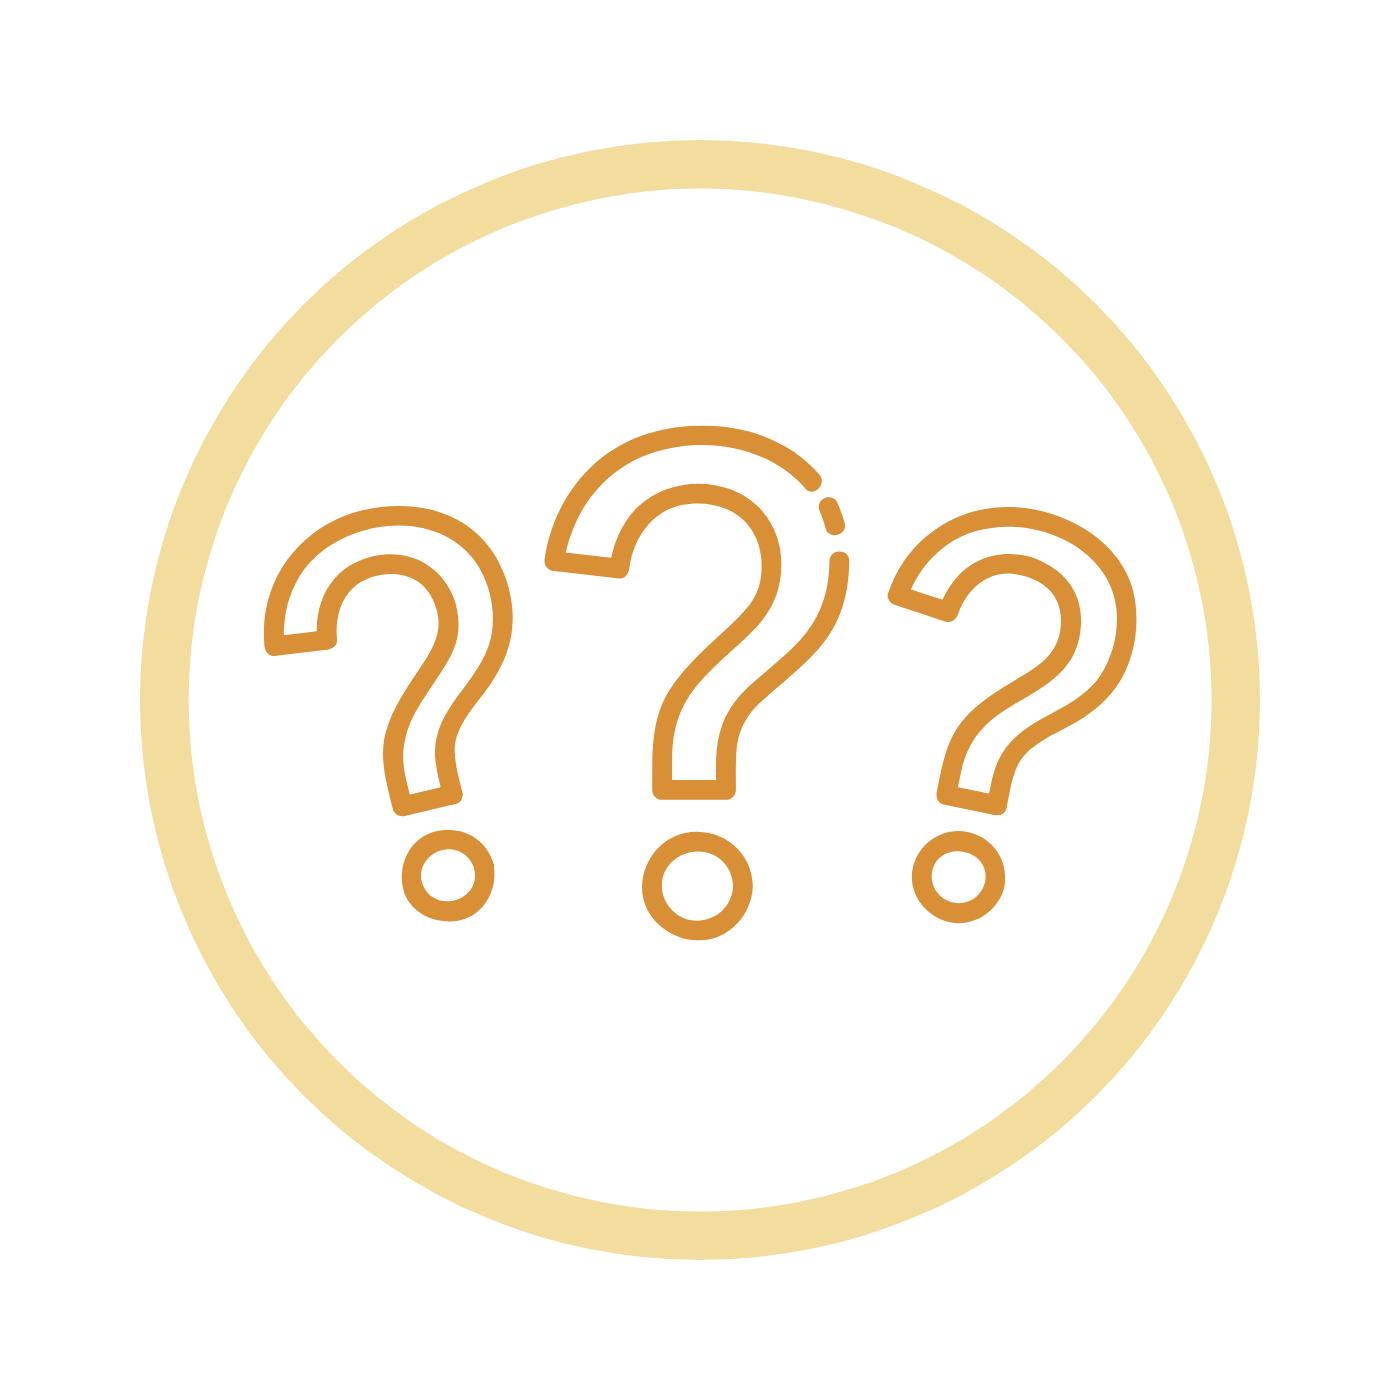 150.png (6.0kB) Lien vers: https://lacagette-coop.fr/?QuestionsReponses